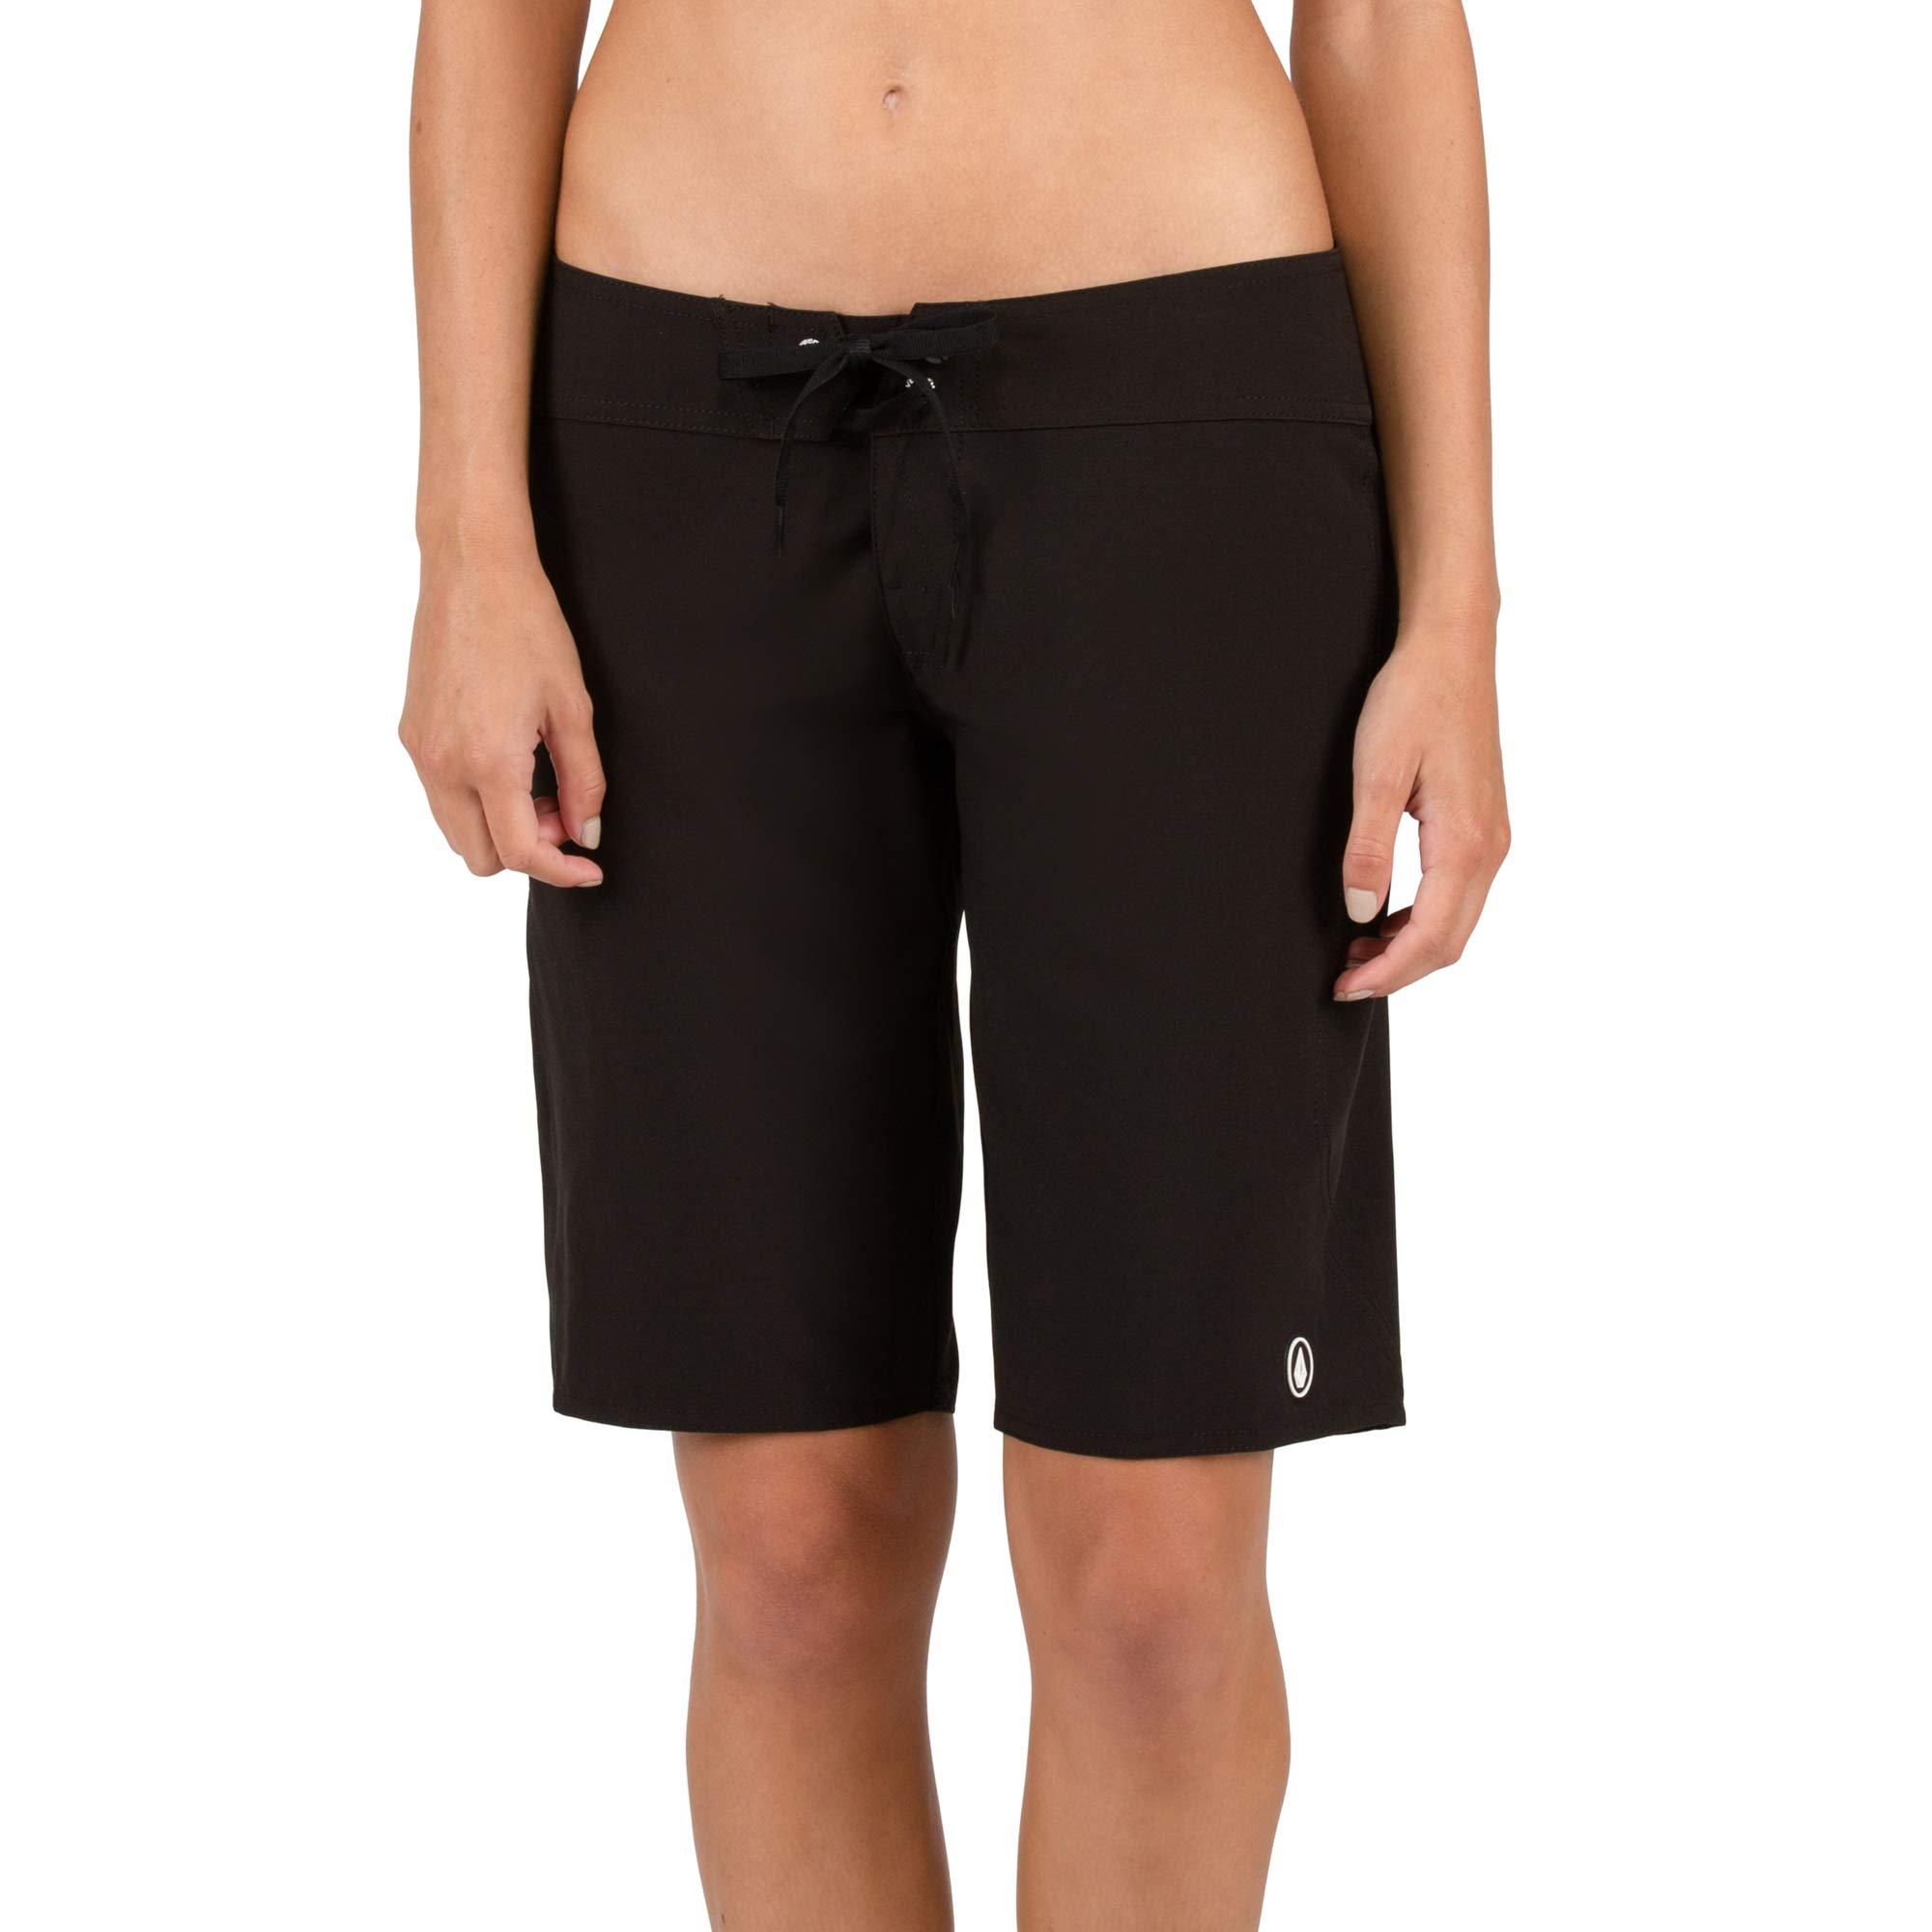 Volcom Women's Simply Solid 11-inch Classic Swim Boardshort, Black, 13